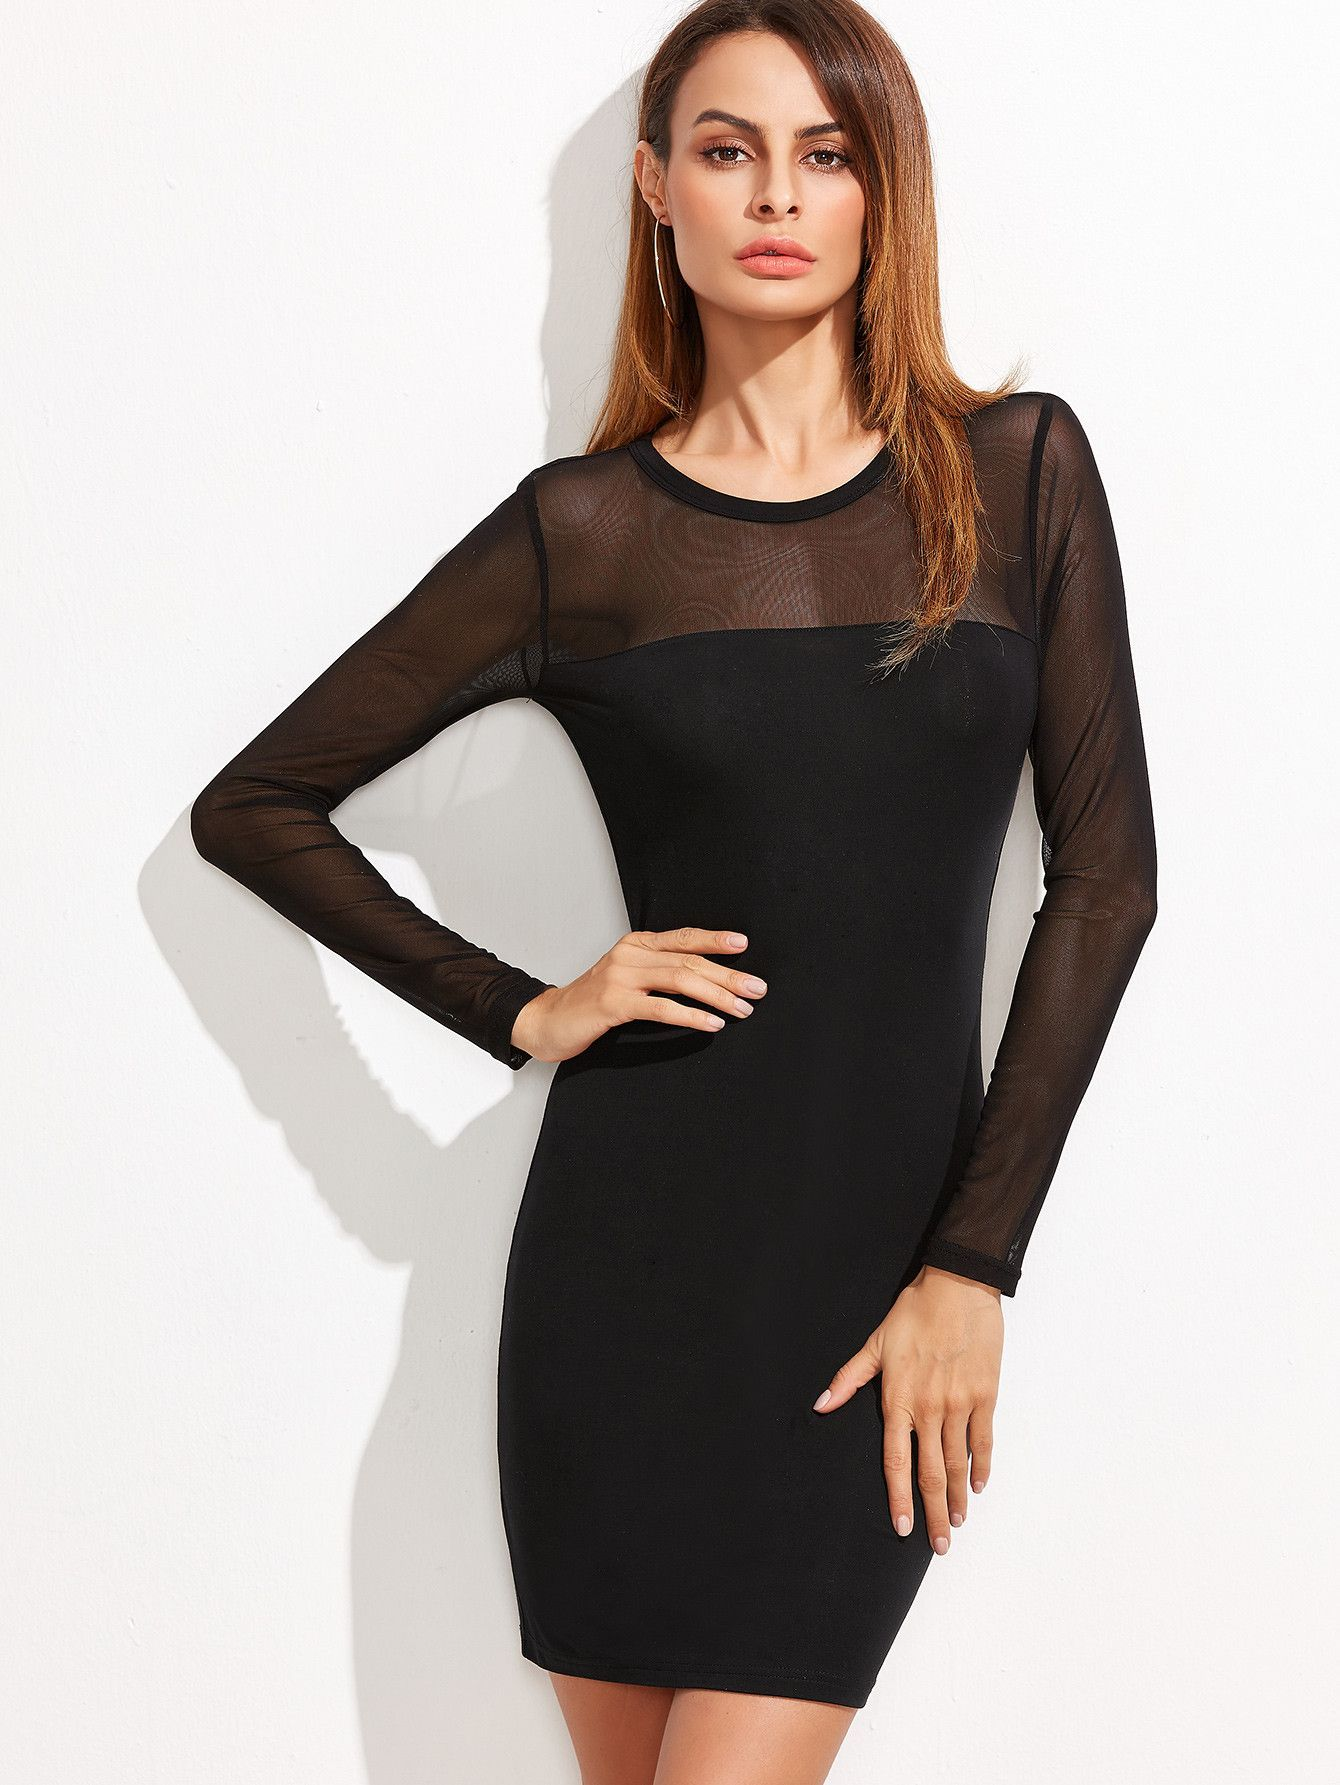 45++ Sheer sleeve dress information